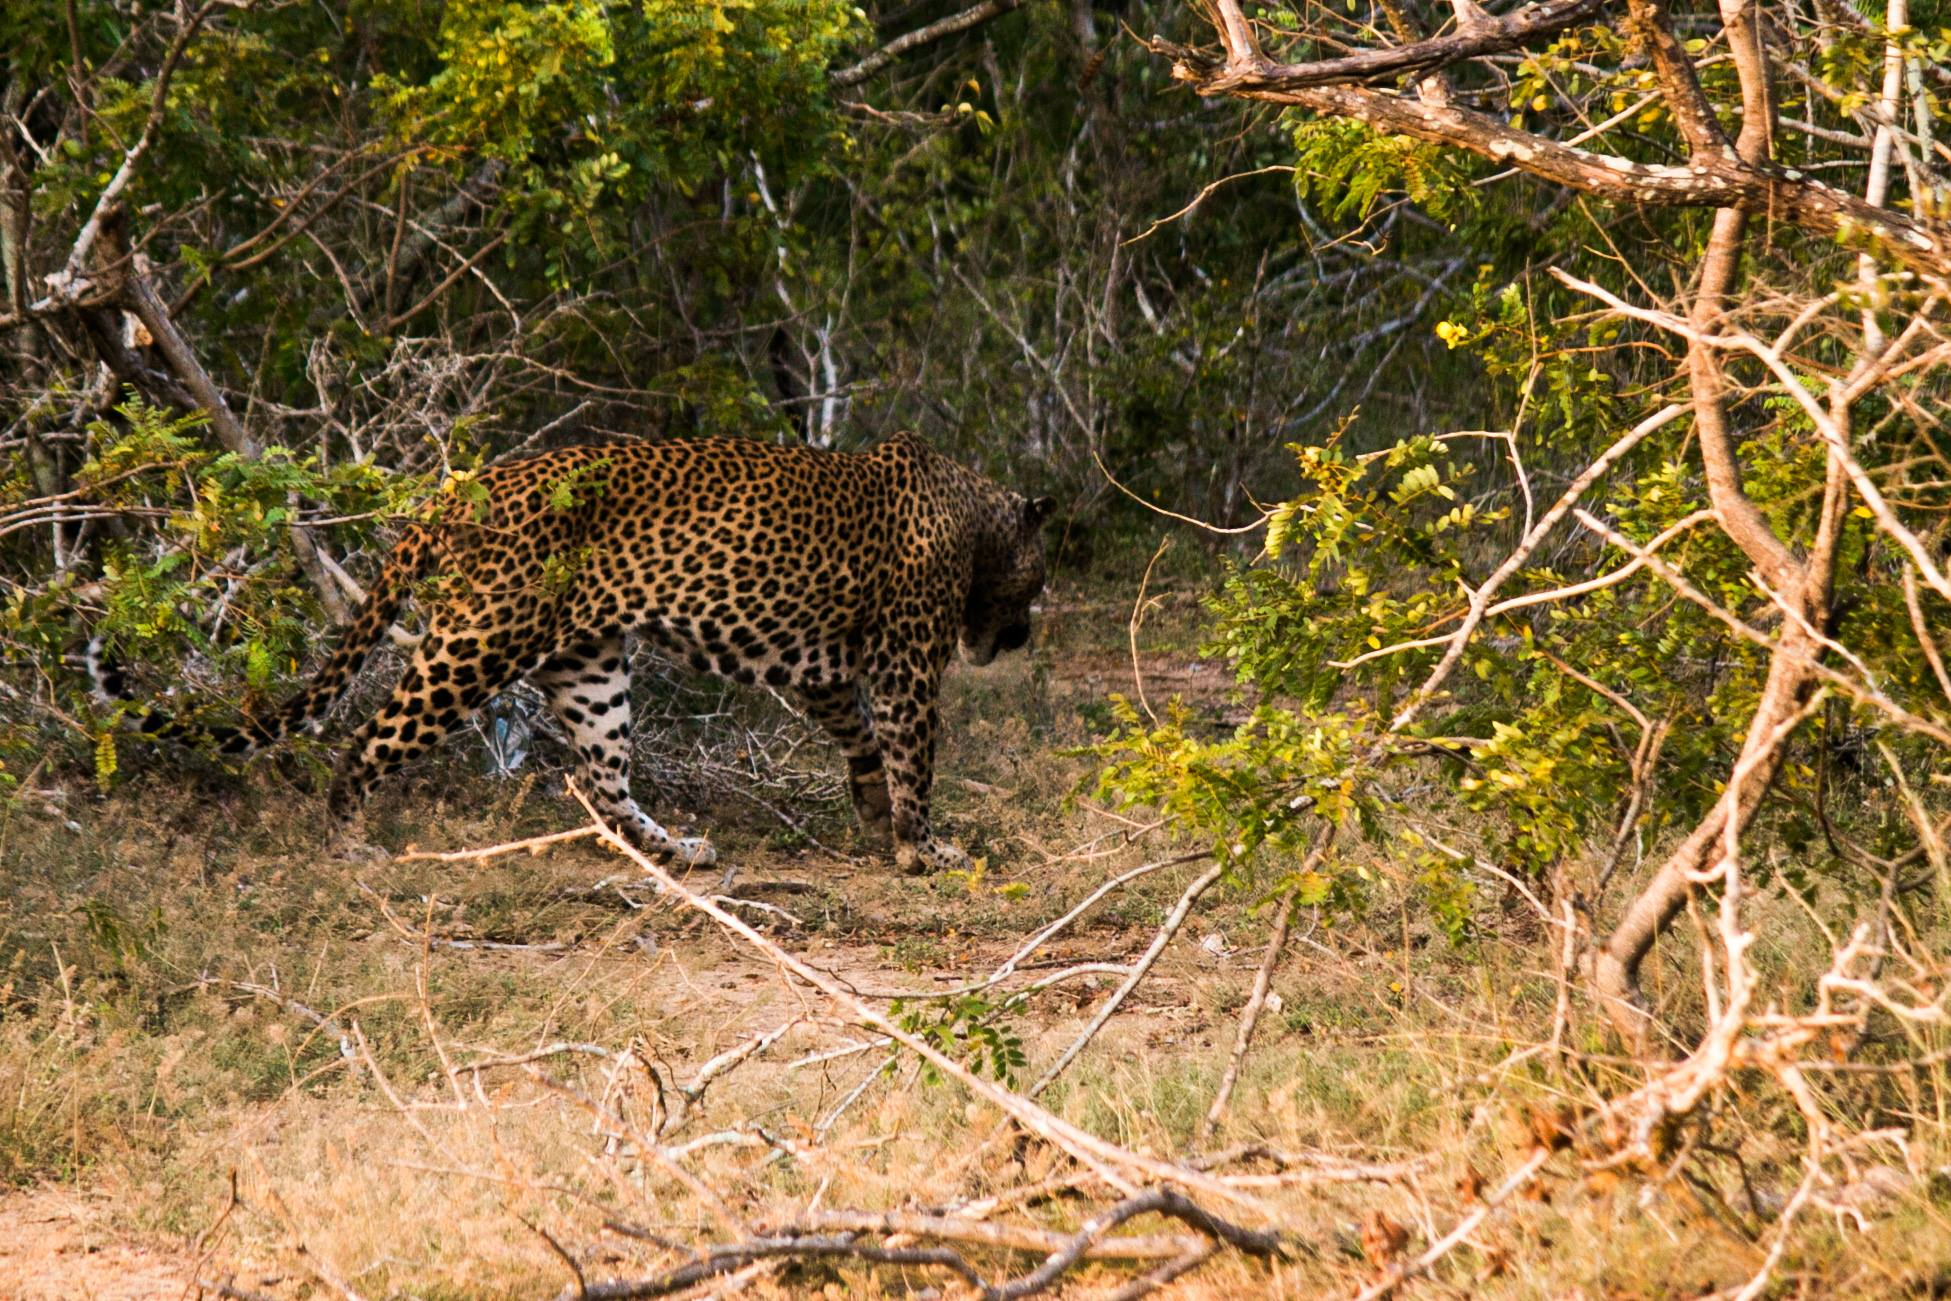 invite-to-paradise-sri-lanka-and-maldives-specialists-travel-agent-tour-operator-customer-review-feedback-joel-rhian-leopard-safari-2.jpg